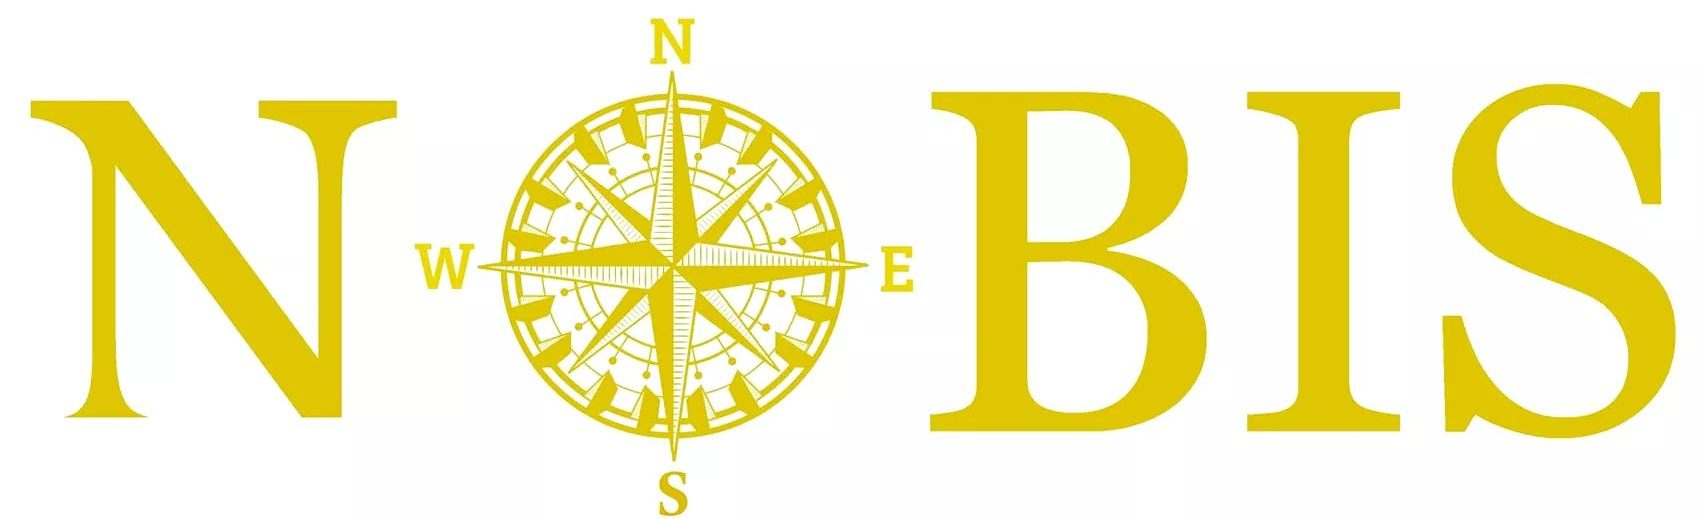 Turistička agencija Nobis | Uvjeti poslovanja - Turistička agencija Nobis